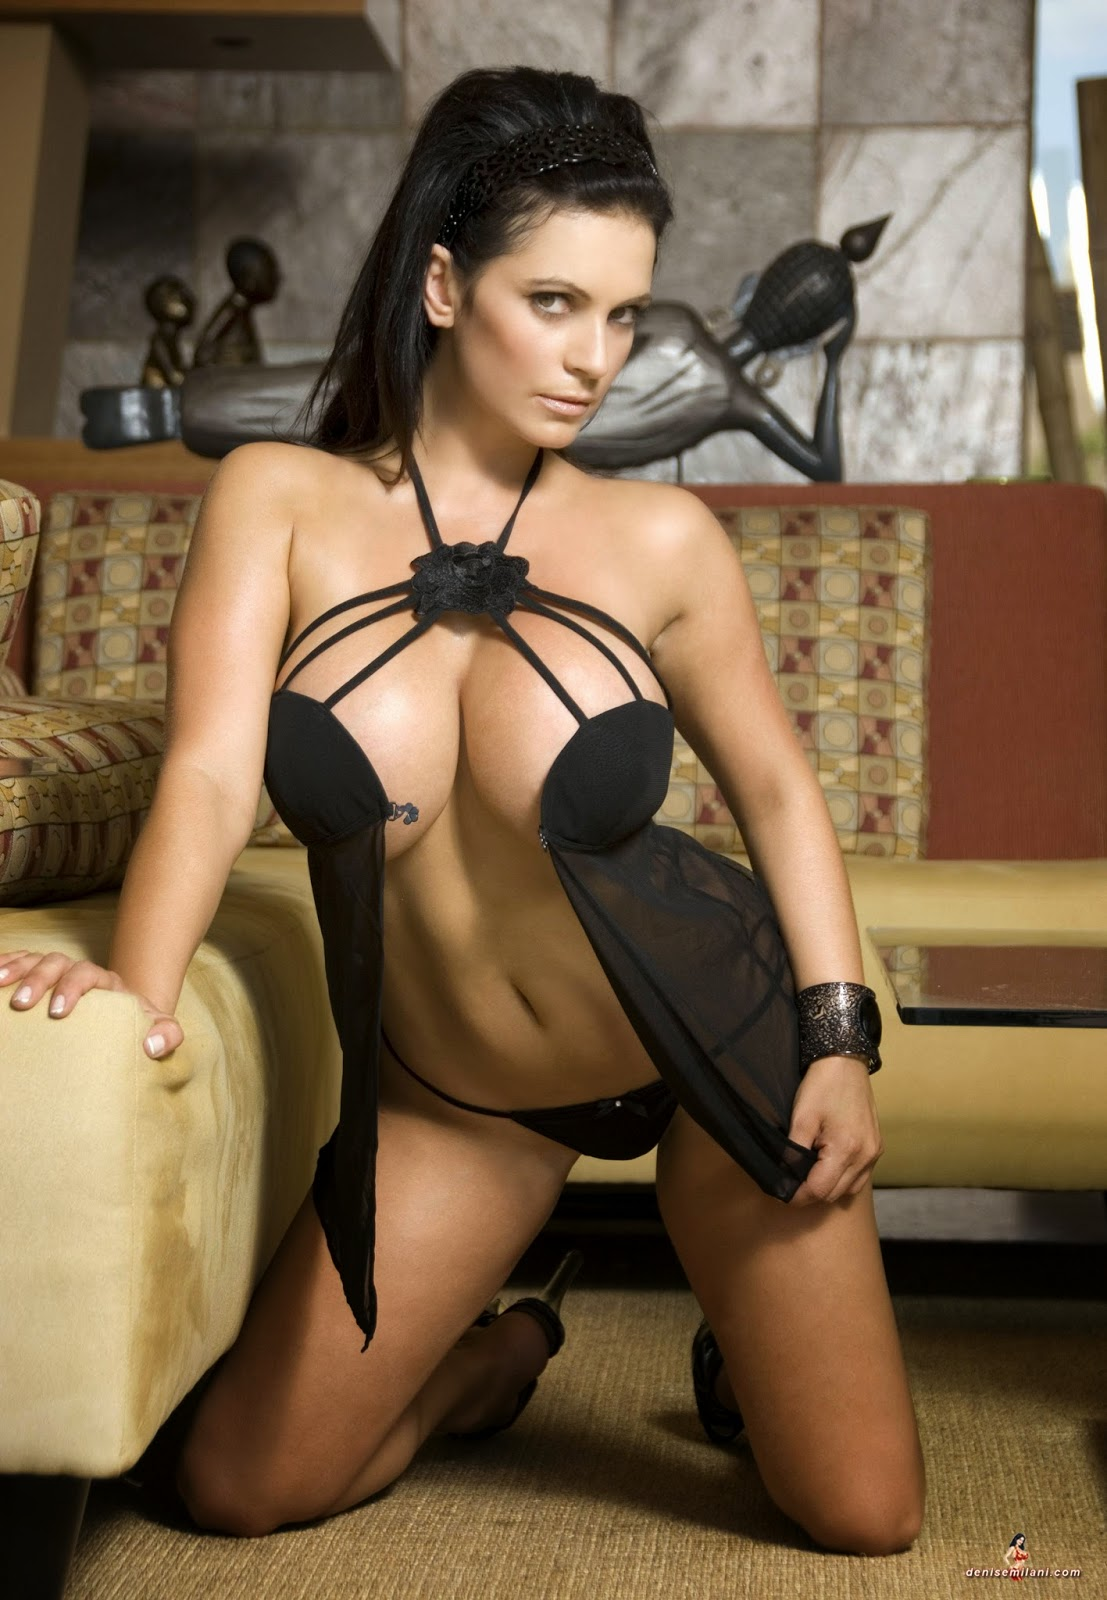 hot women lingerie nude